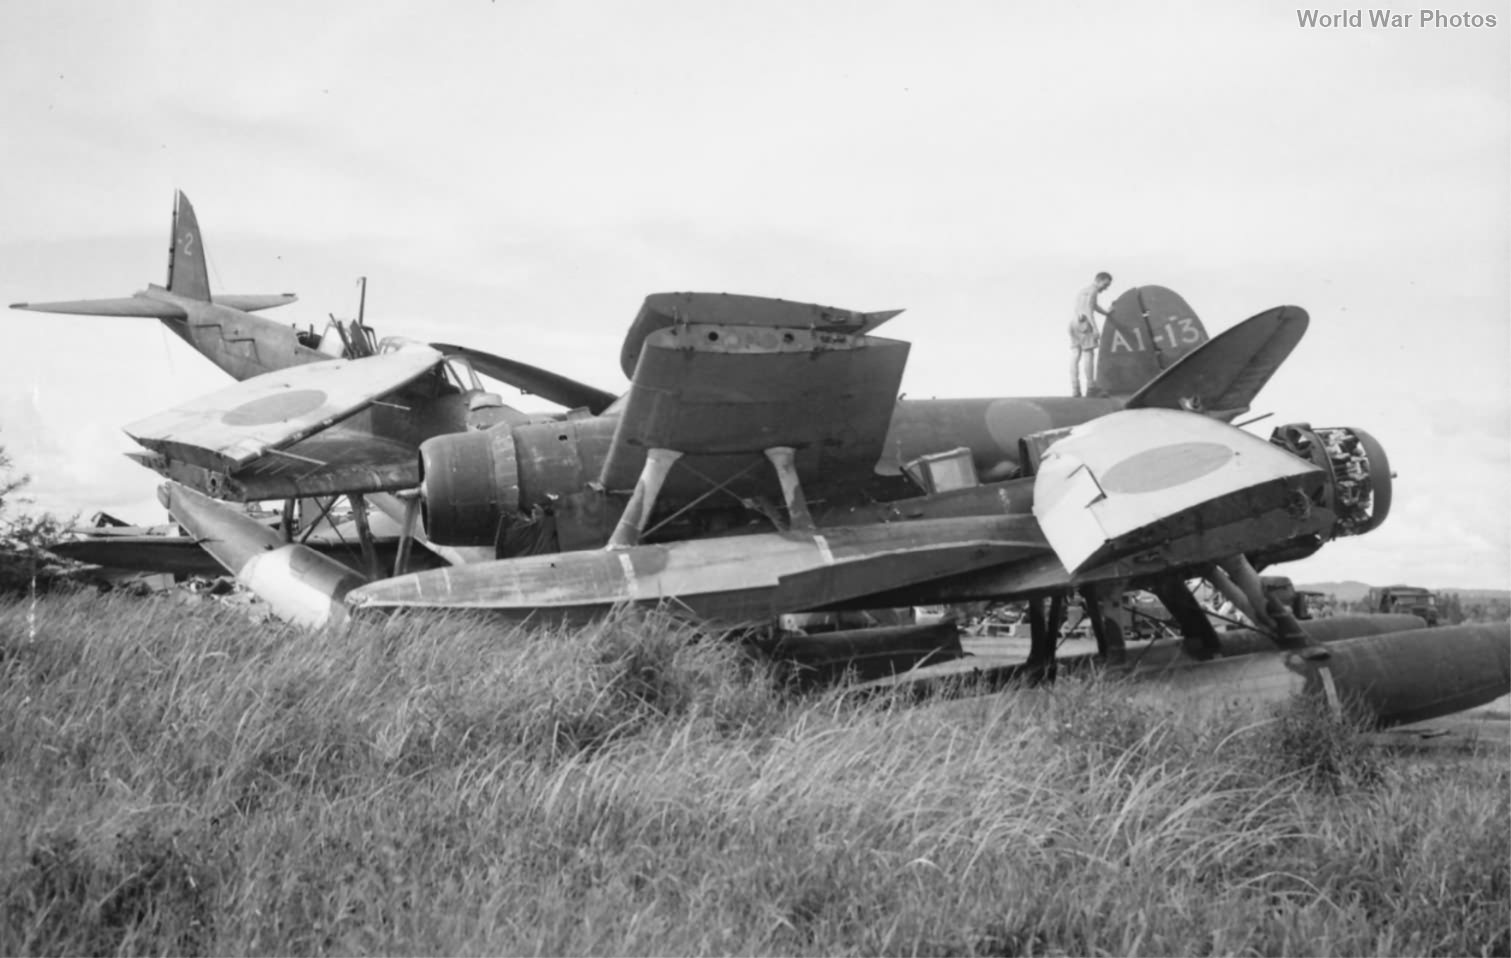 Aichi E13A floatplanes at Seletar airfield 1945